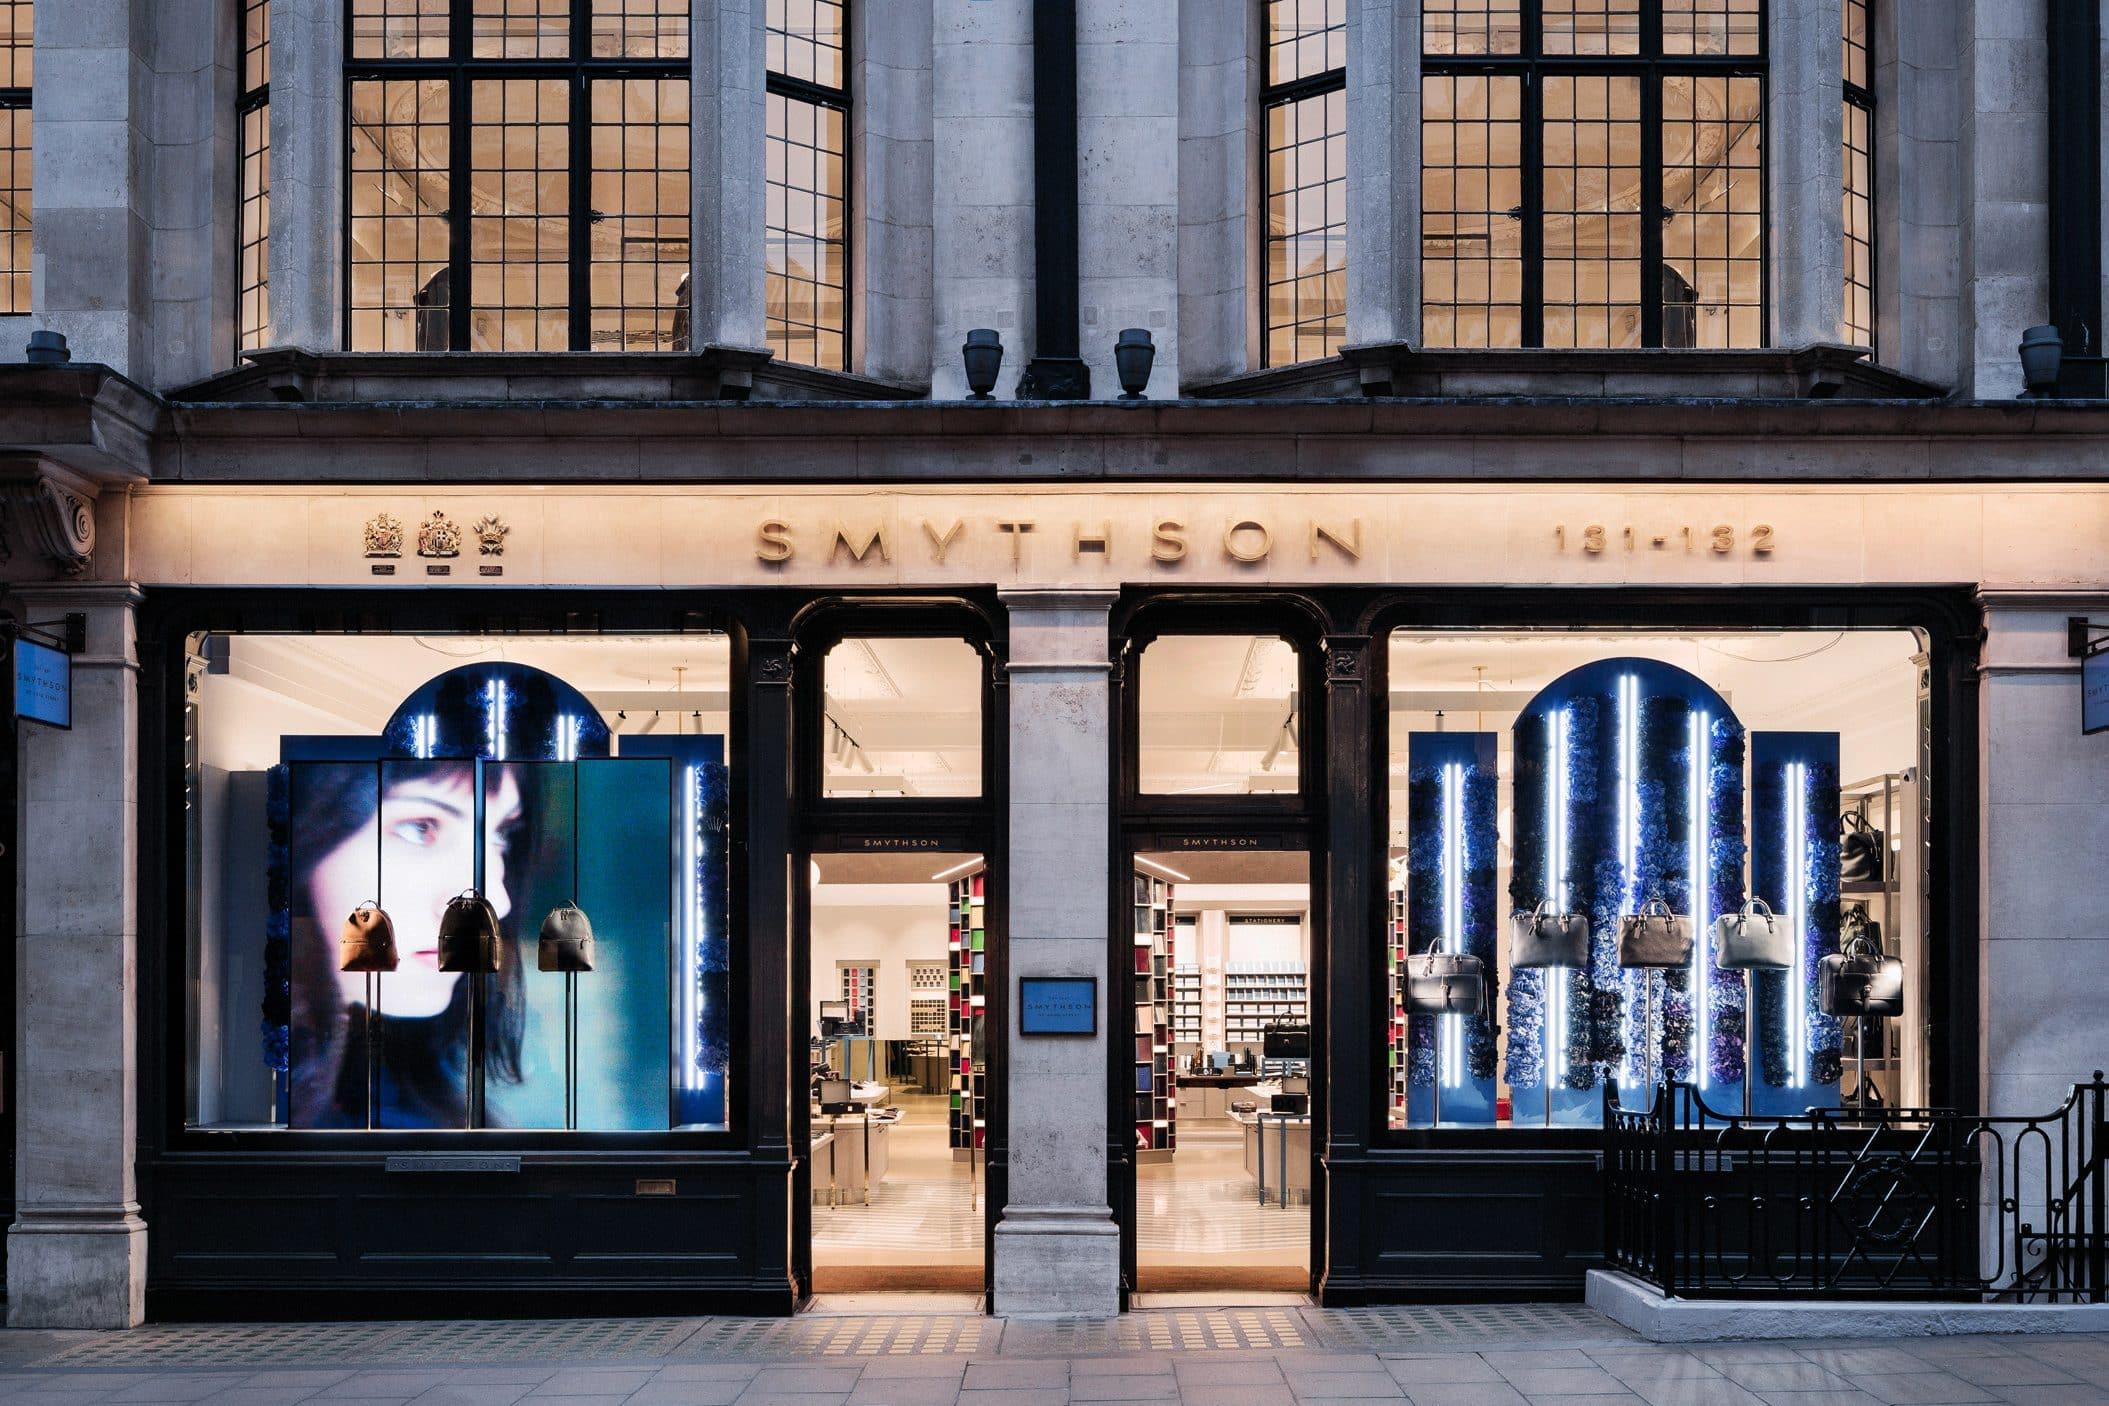 Exterior of Smythson shop, London